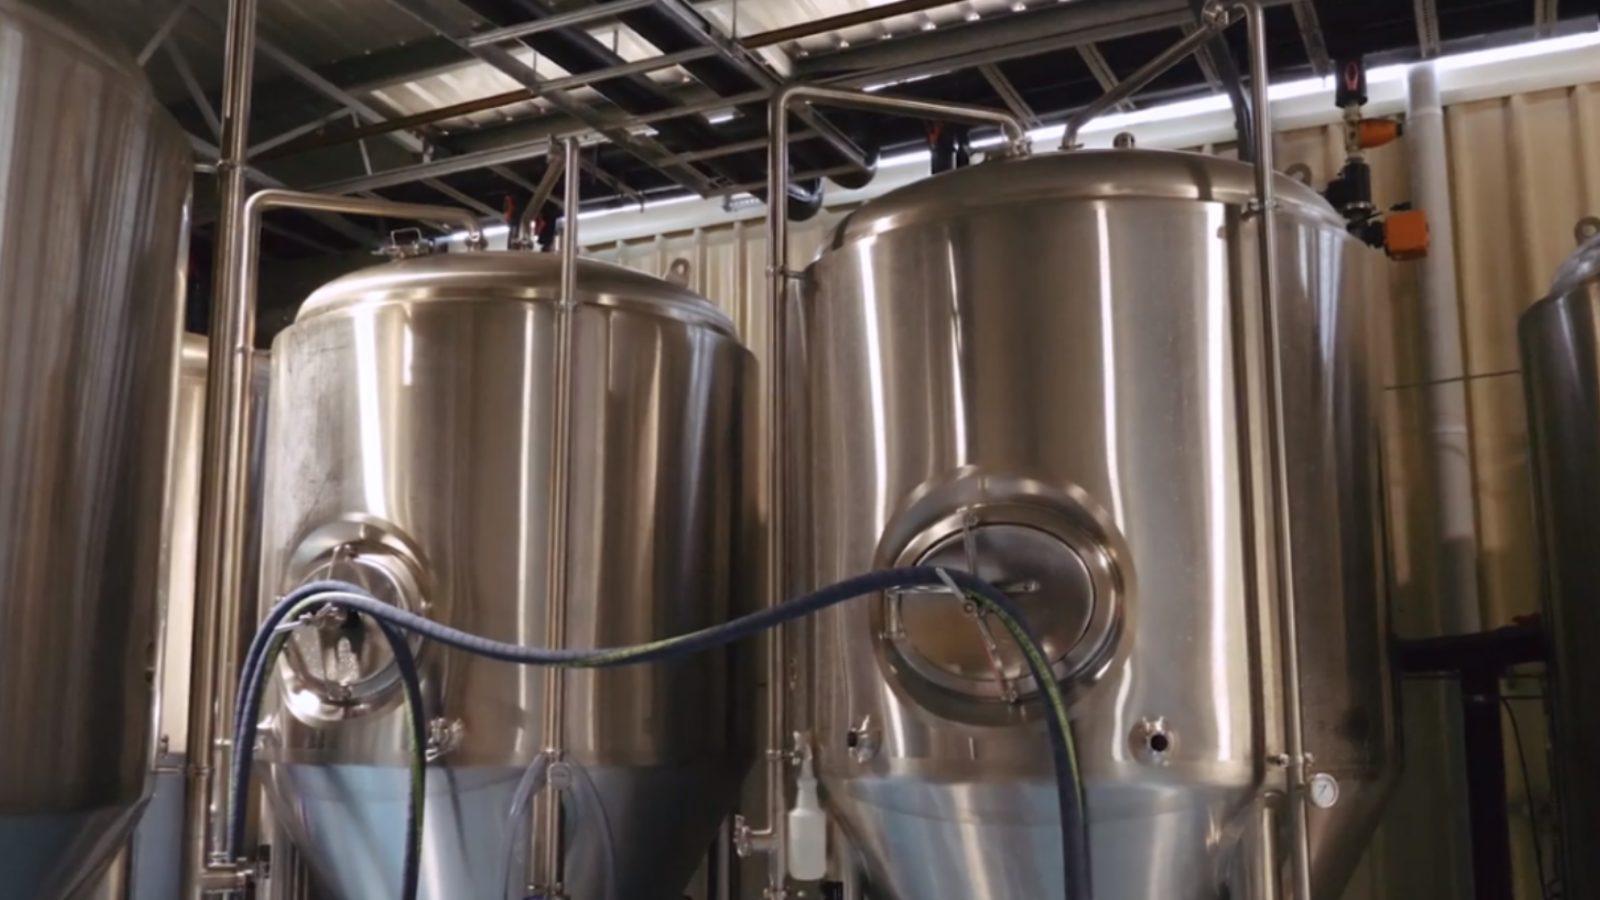 Coastal Brewing Co brewing equipment